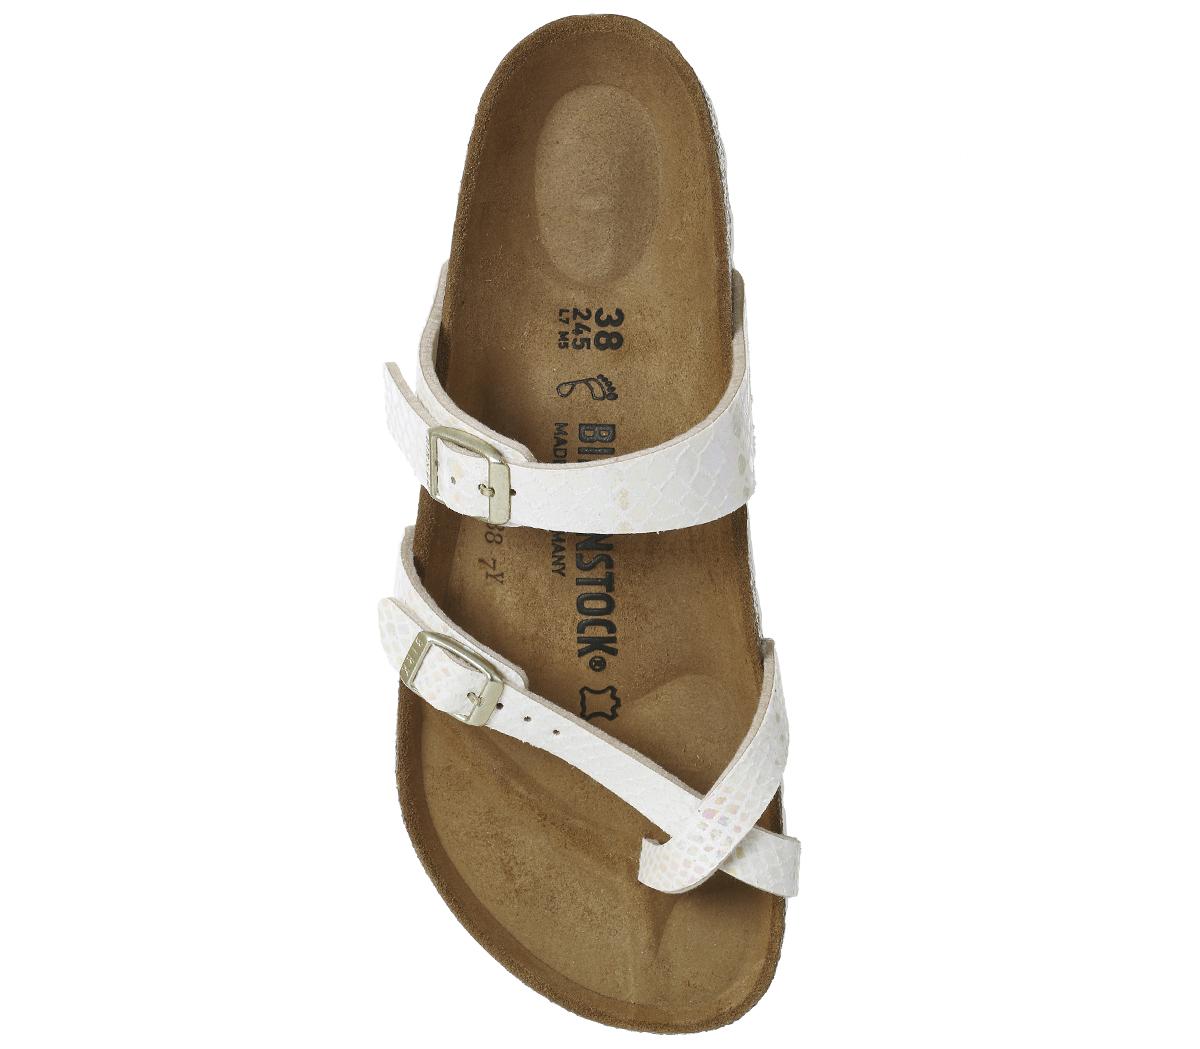 4767e01458d Womens Birkenstock Mayari Cross Strap Sandals SHINY SNAKE CREAM ...